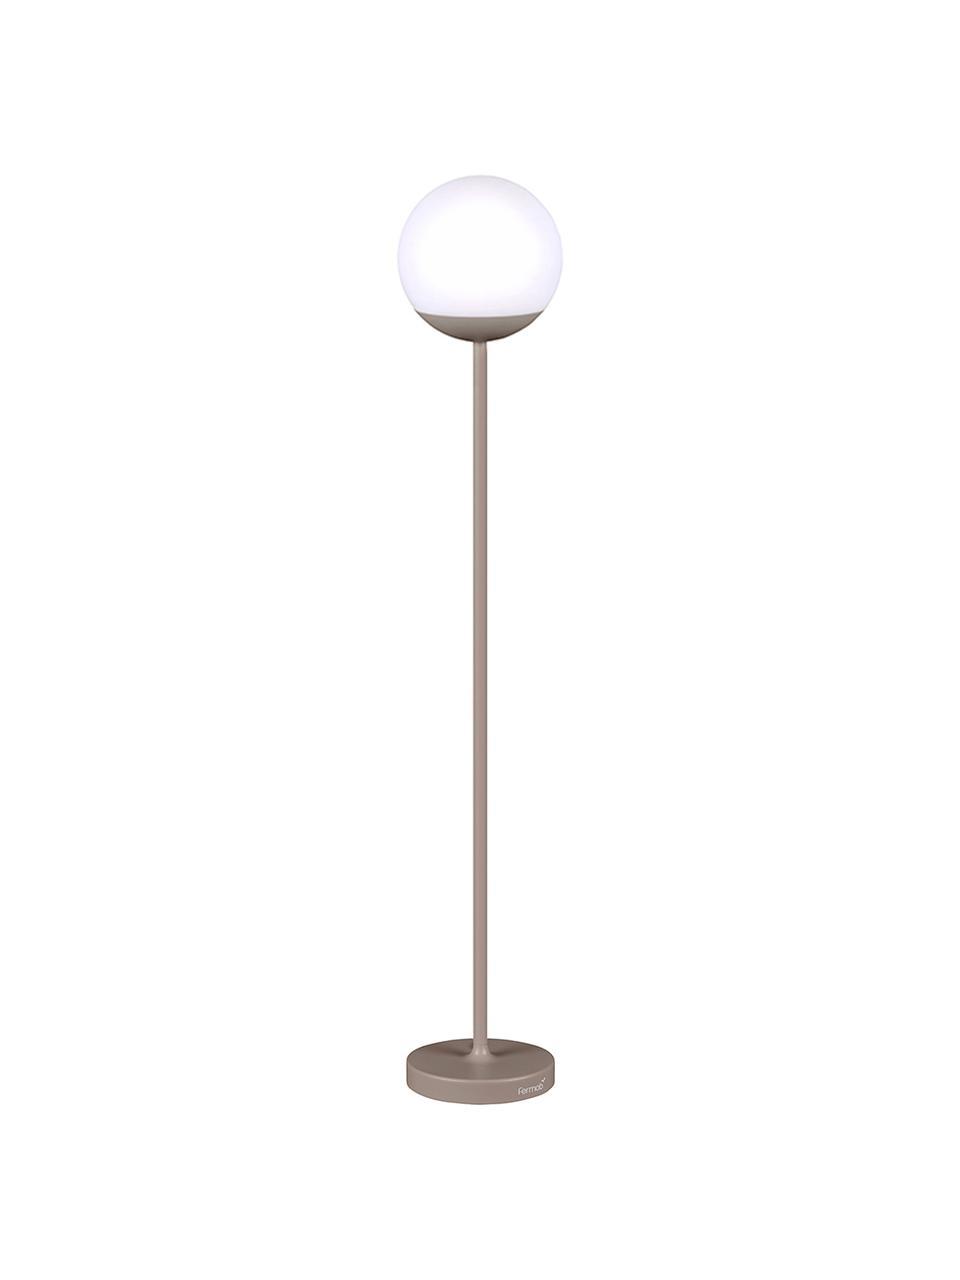 Mobile Outdoor LED-Stehlampe Mooon, Lampenfuß: Aluminium, lackiert, Lampenschirm: Kunststoff, Muskatbraun, Ø 25 x H 134 cm